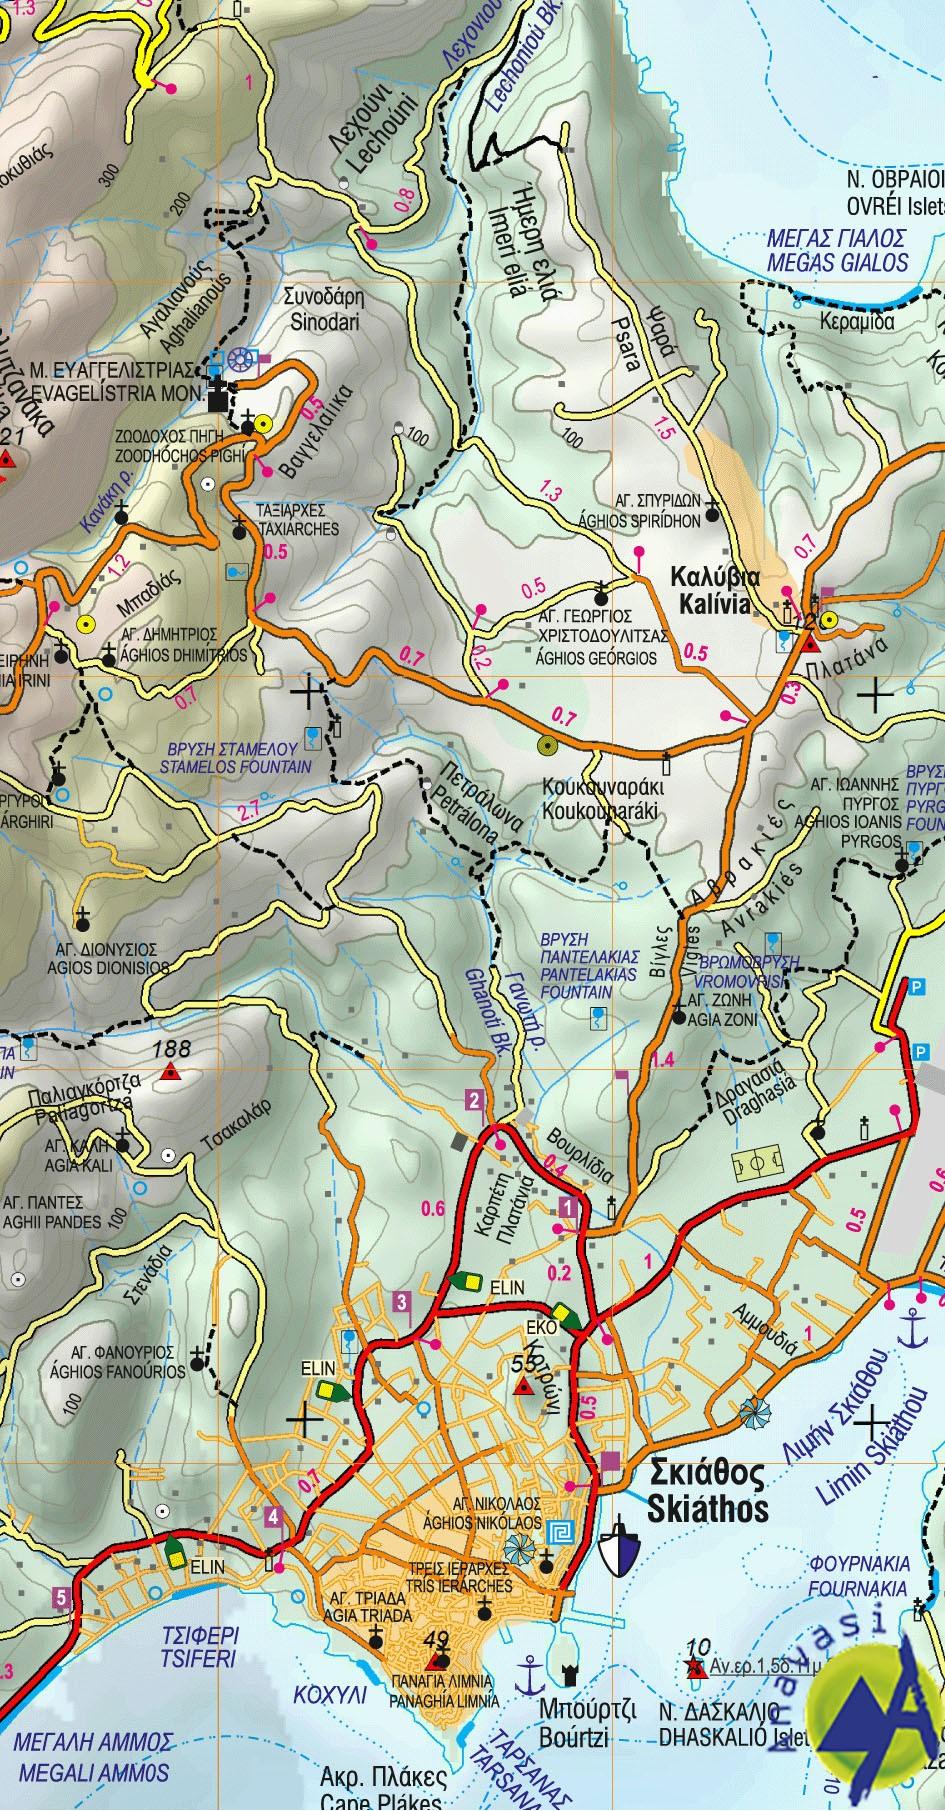 Skiathos • Hiking map 1:25.000